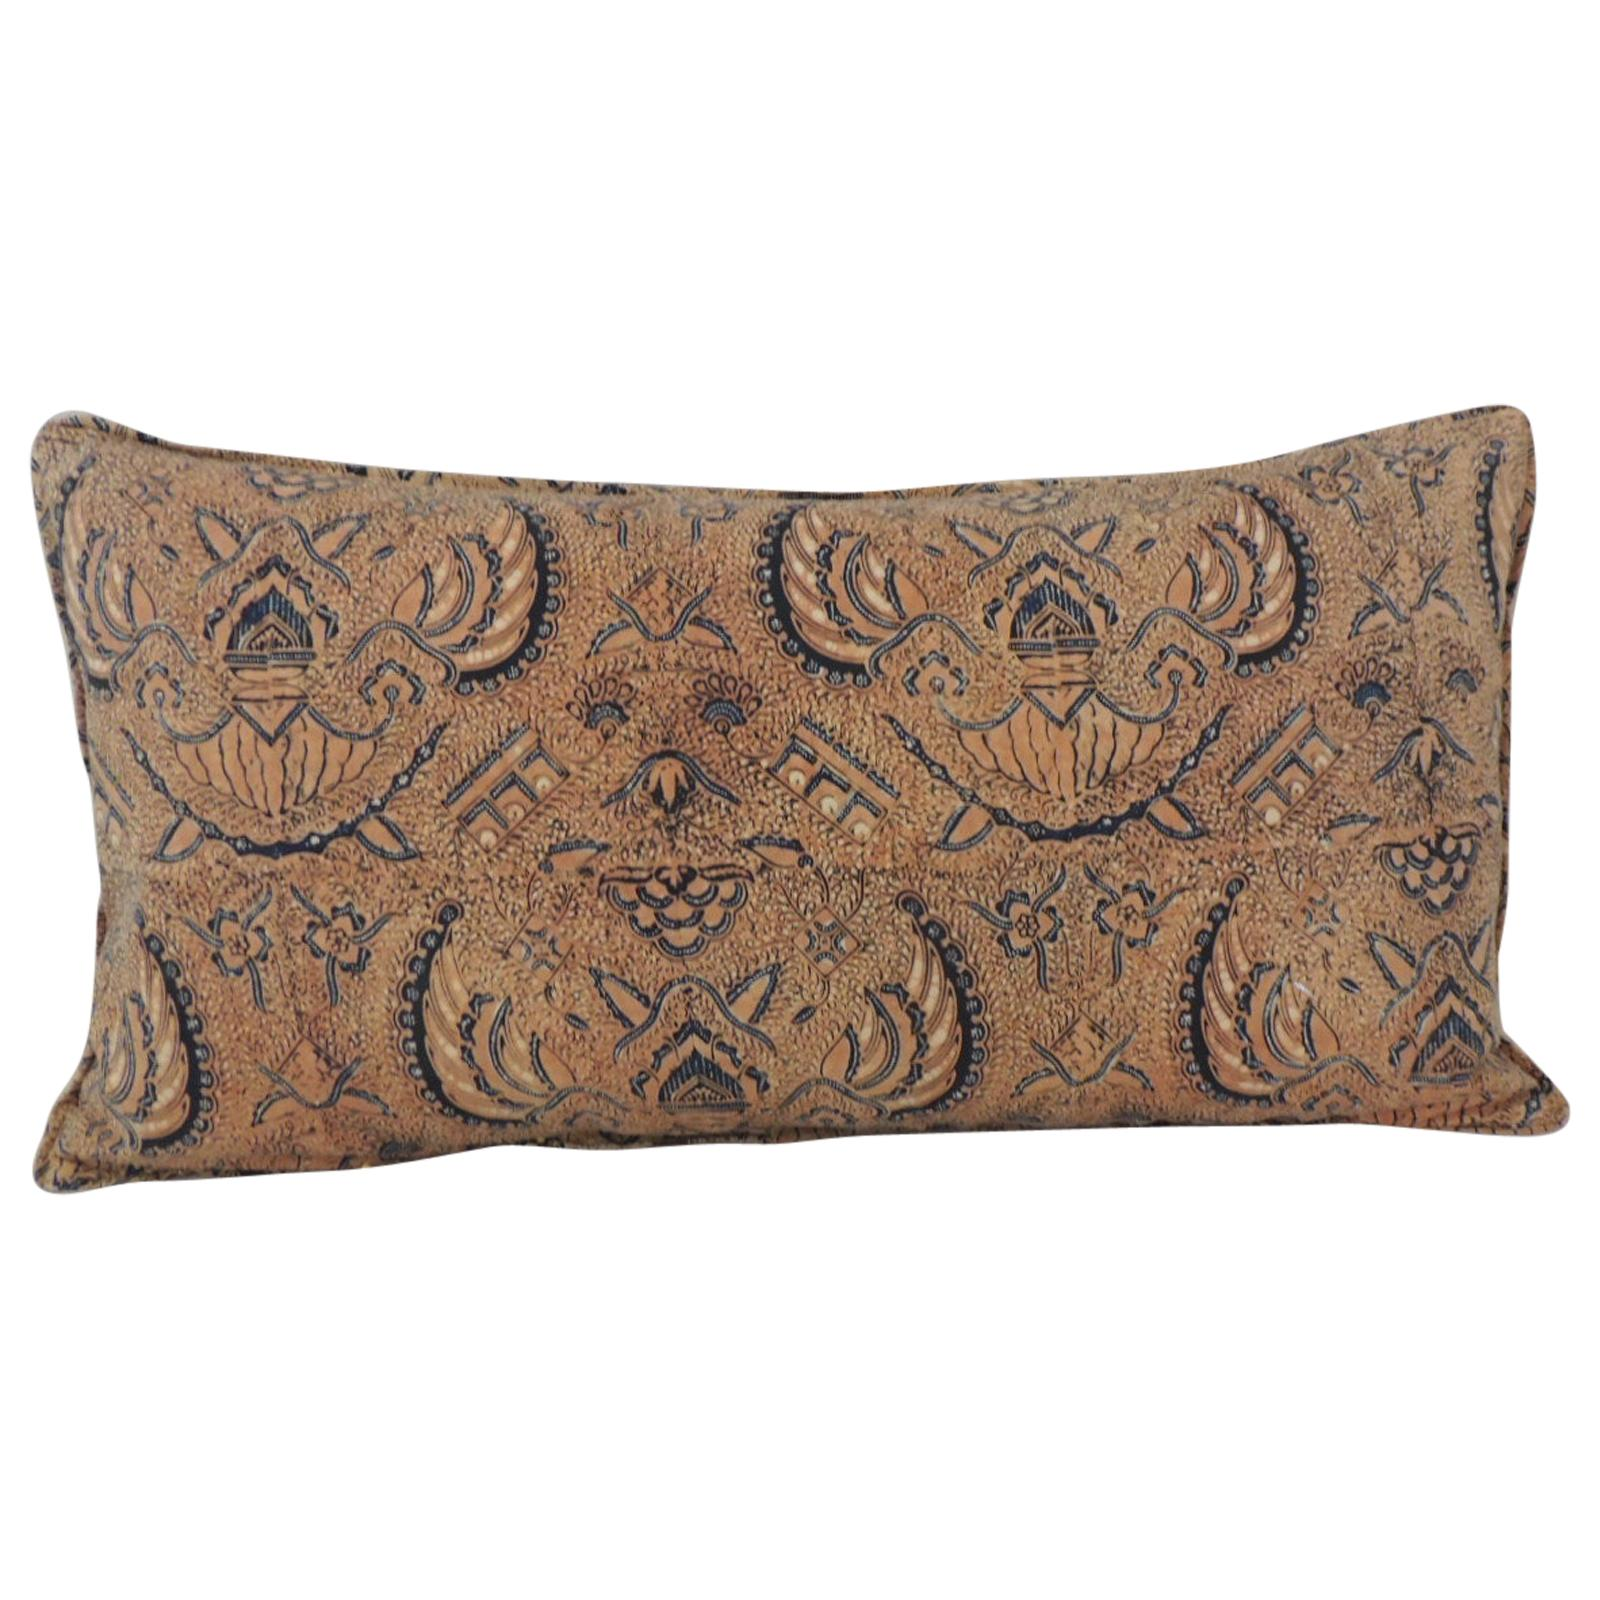 Vintage Yellow and Blue Hand-Blocked Batik Long Bolster Decorative Pillow